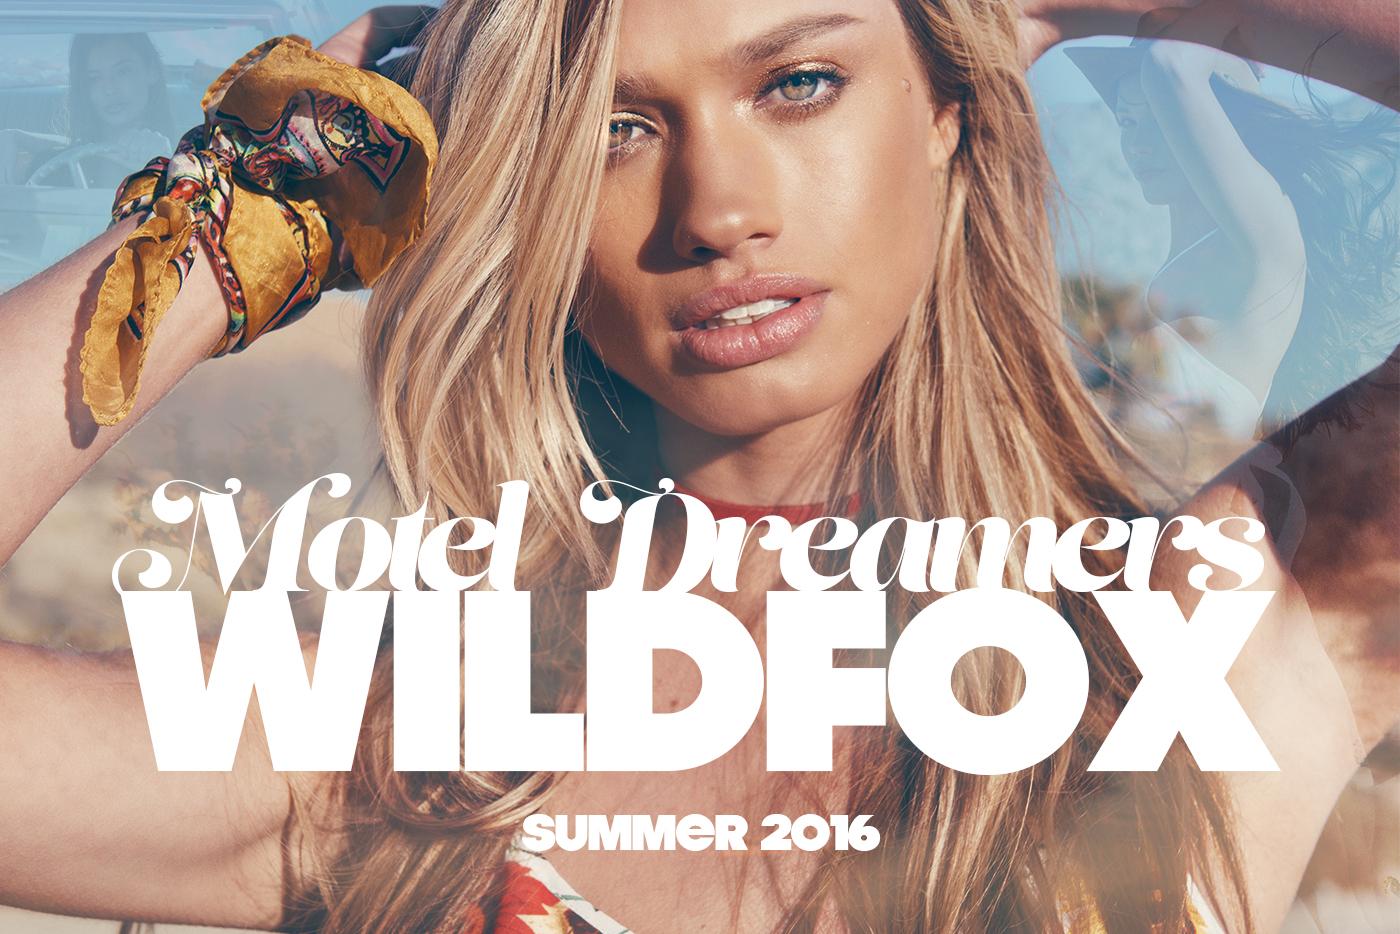 WILDFOX_Sum16_Cover.jpg